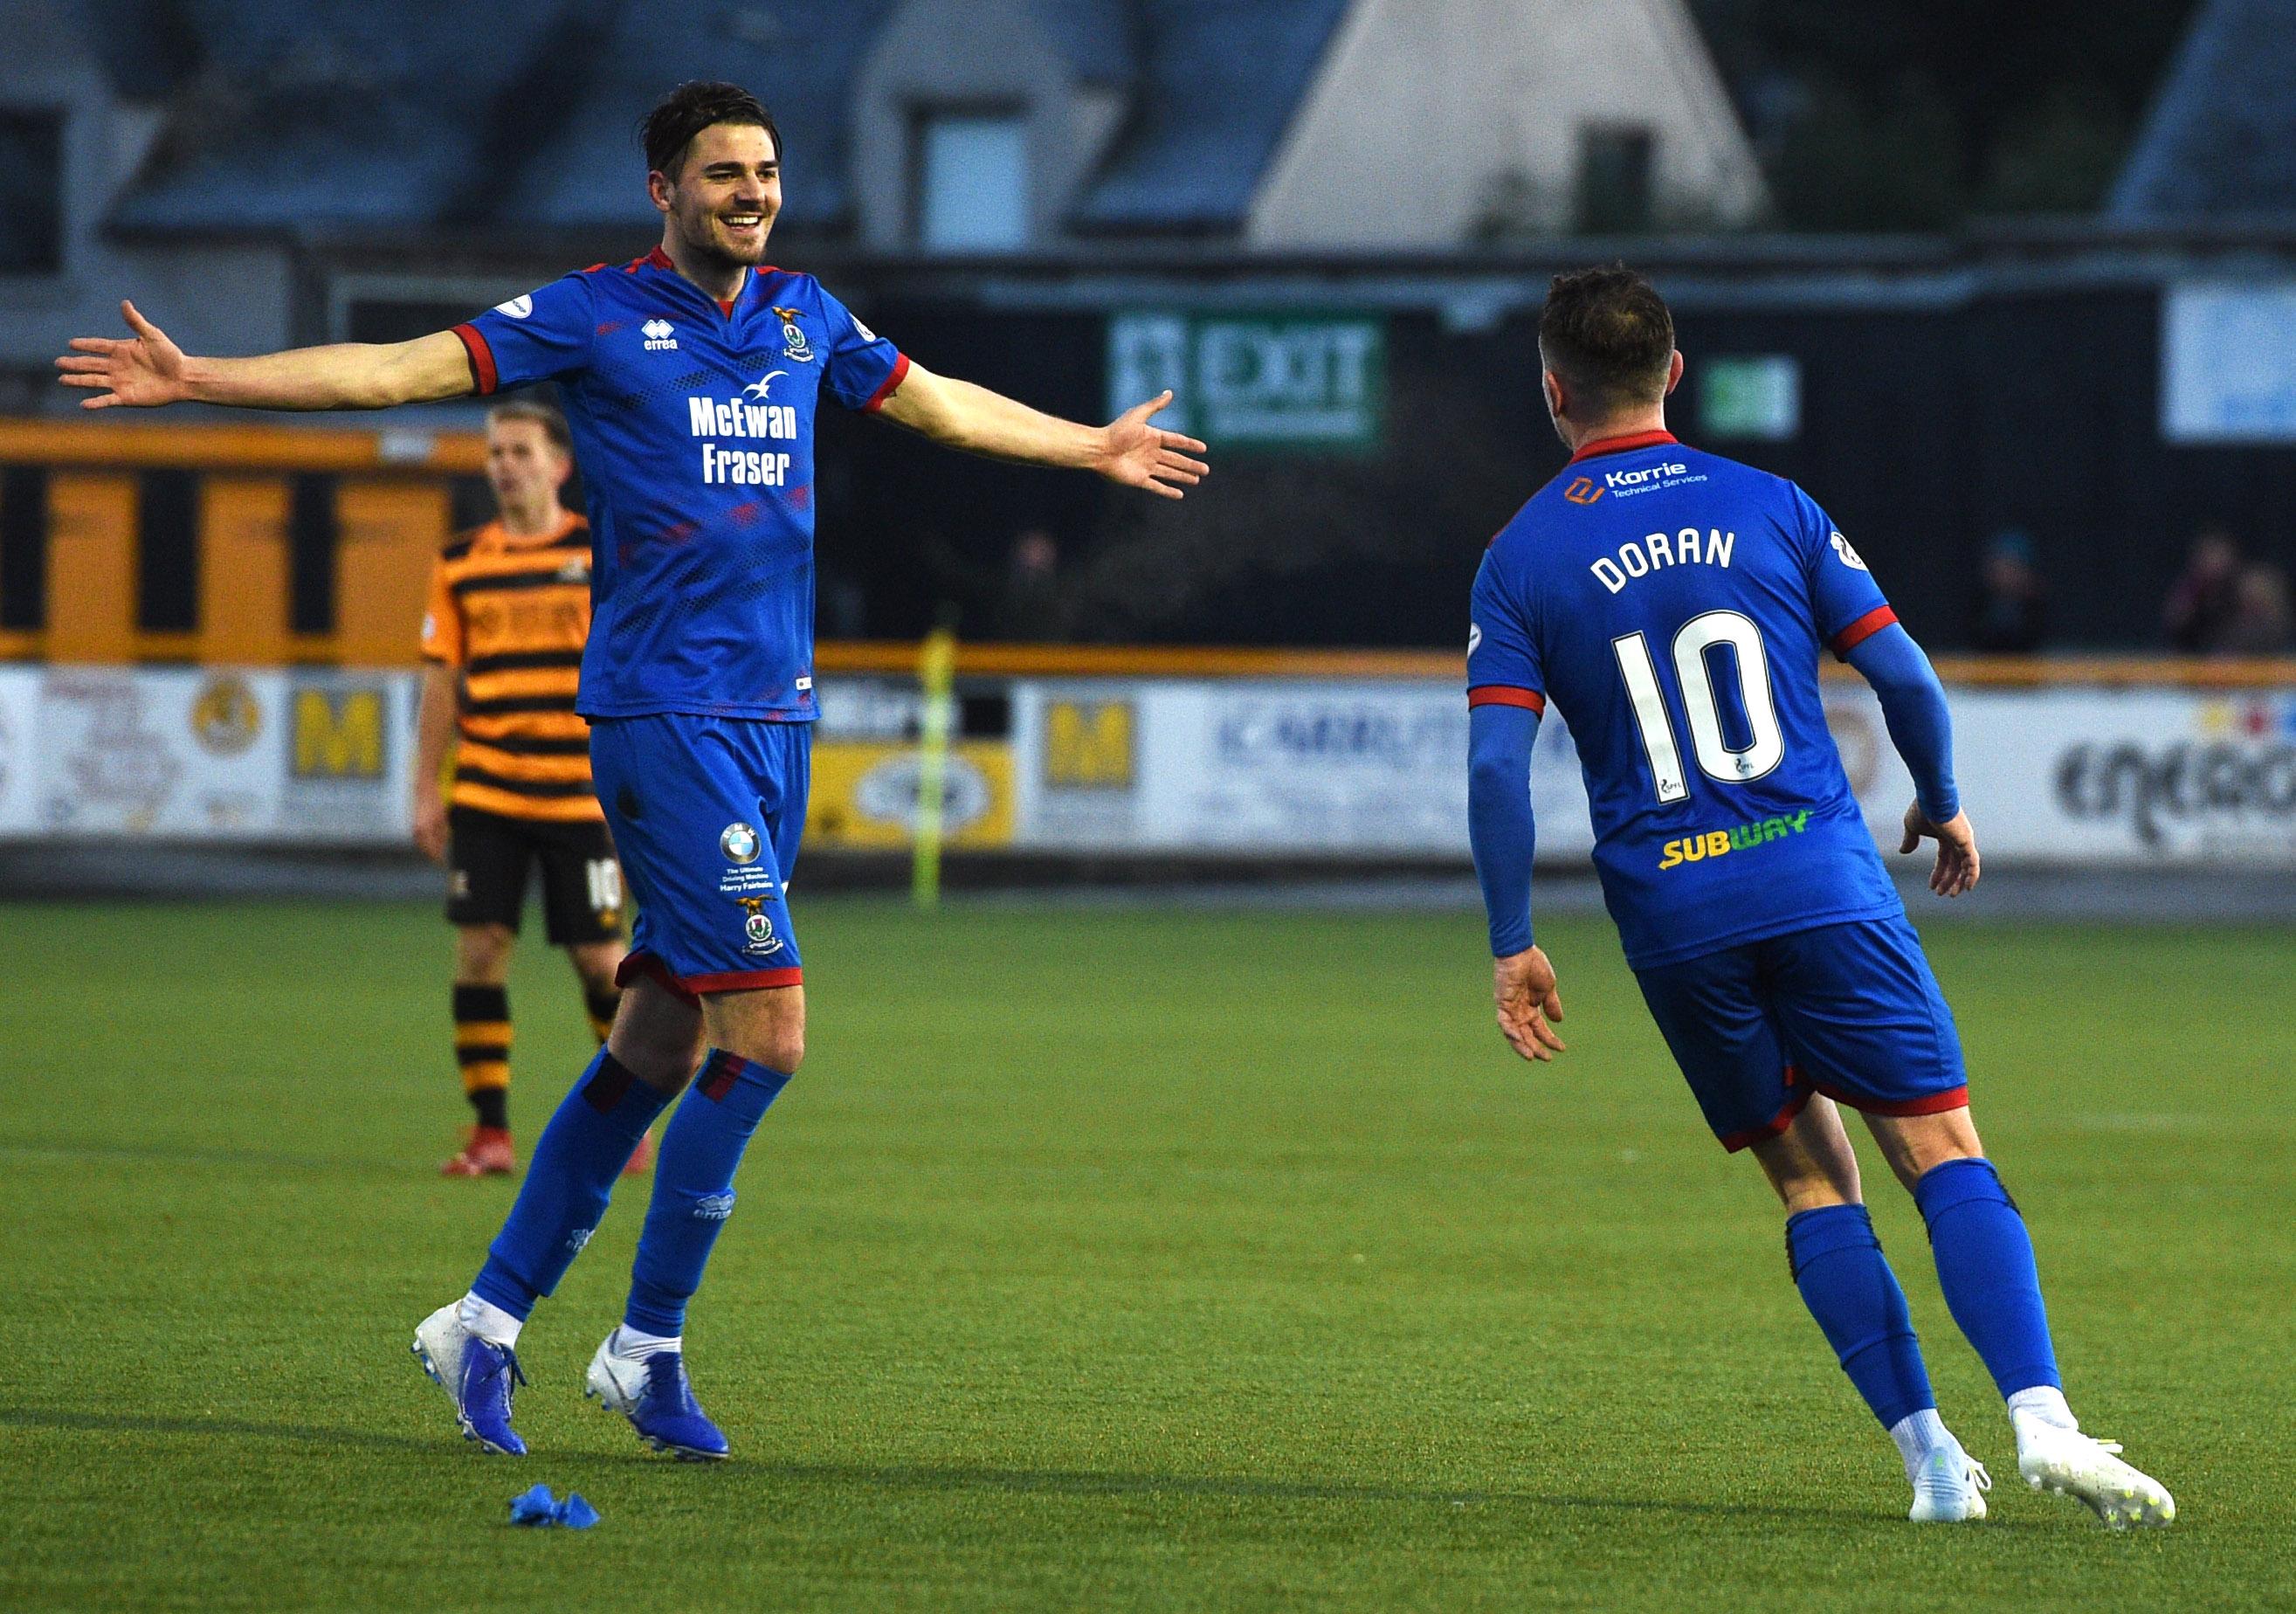 Charlie Trafford and Aaron Doran celebrate the latter's goal against Alloa